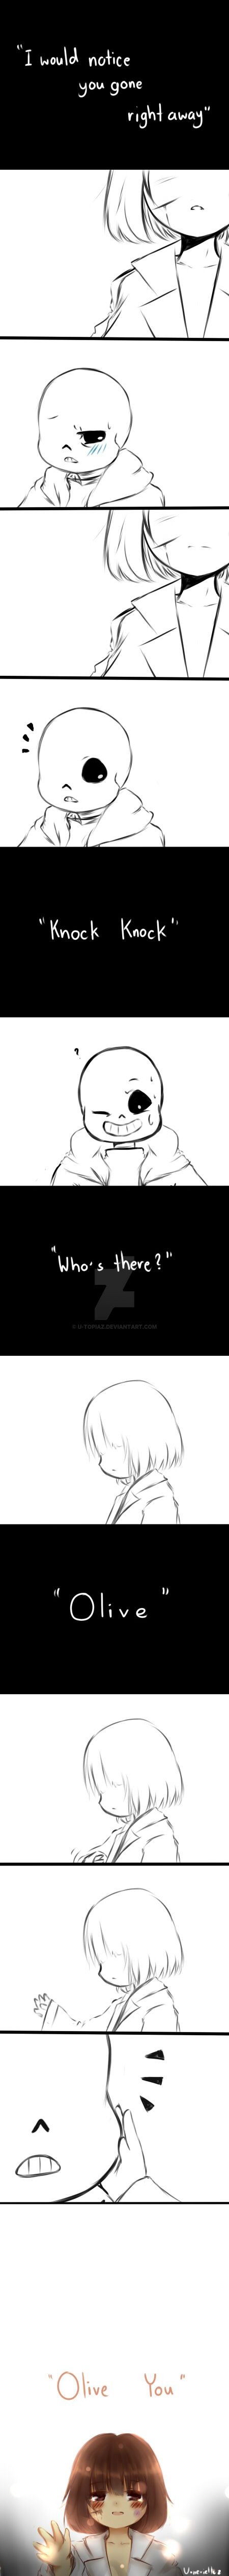 Undertale : Olive who? by TsurunagI